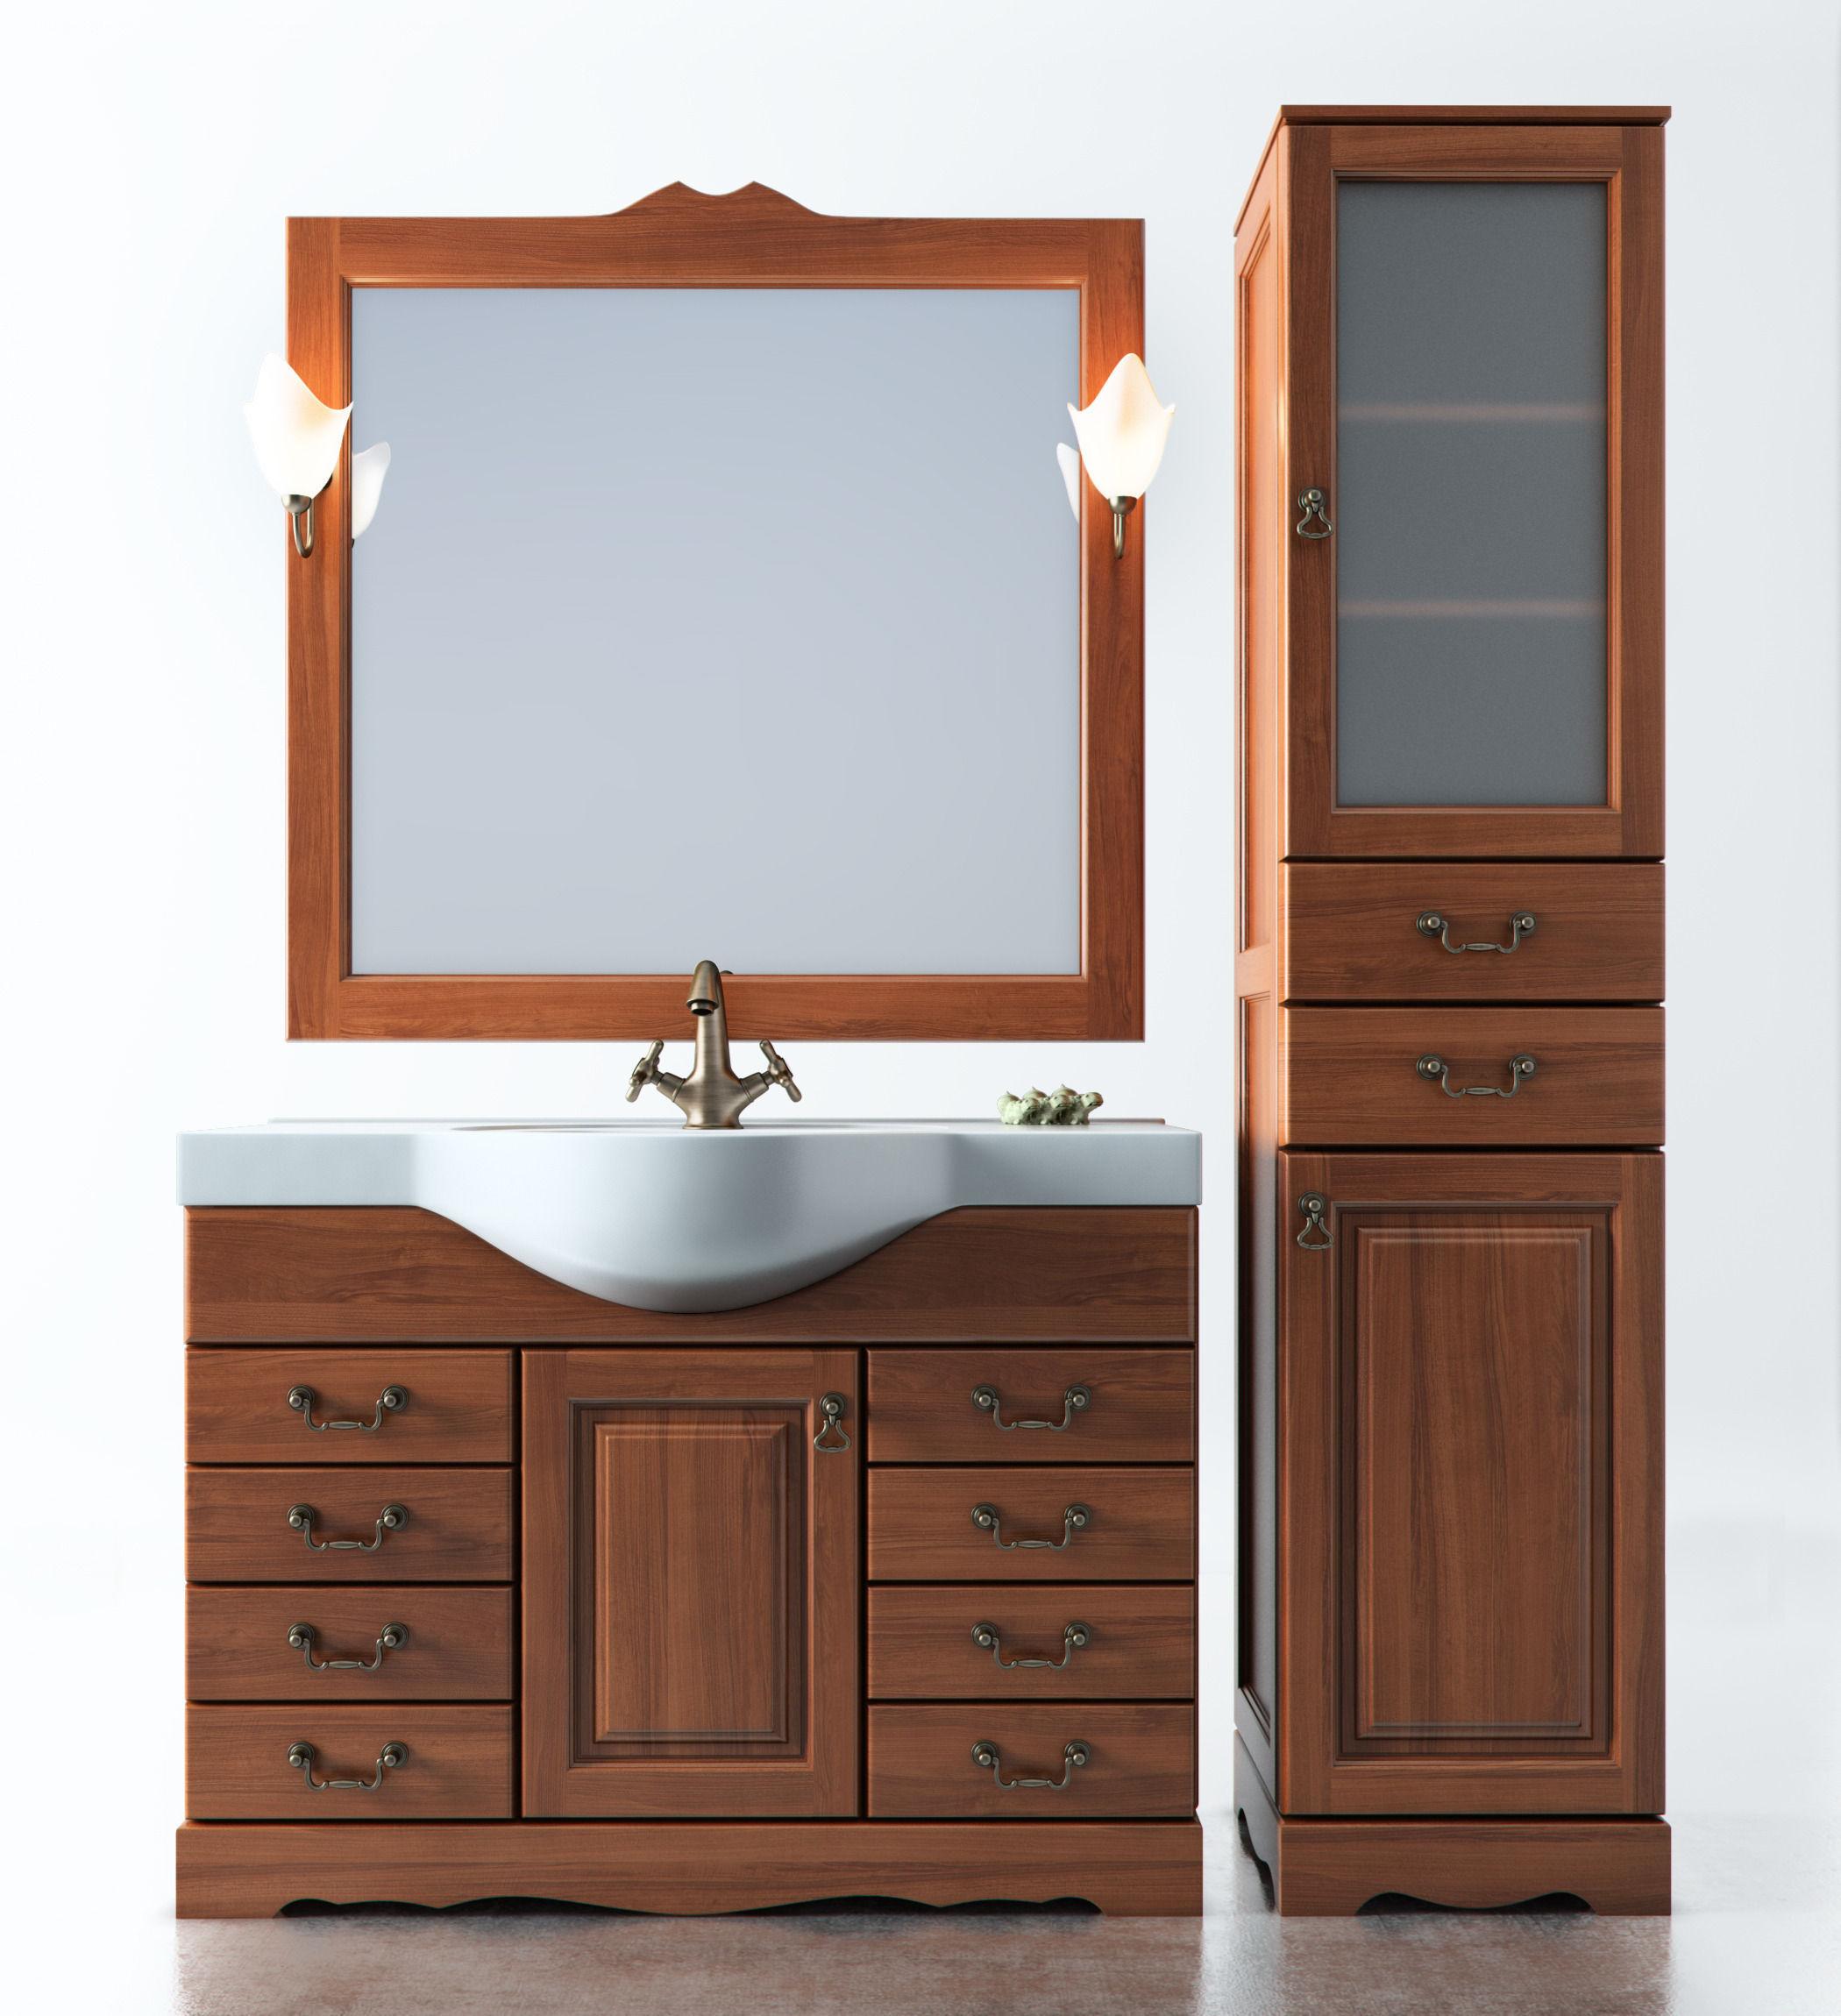 Set of bathroom furniture